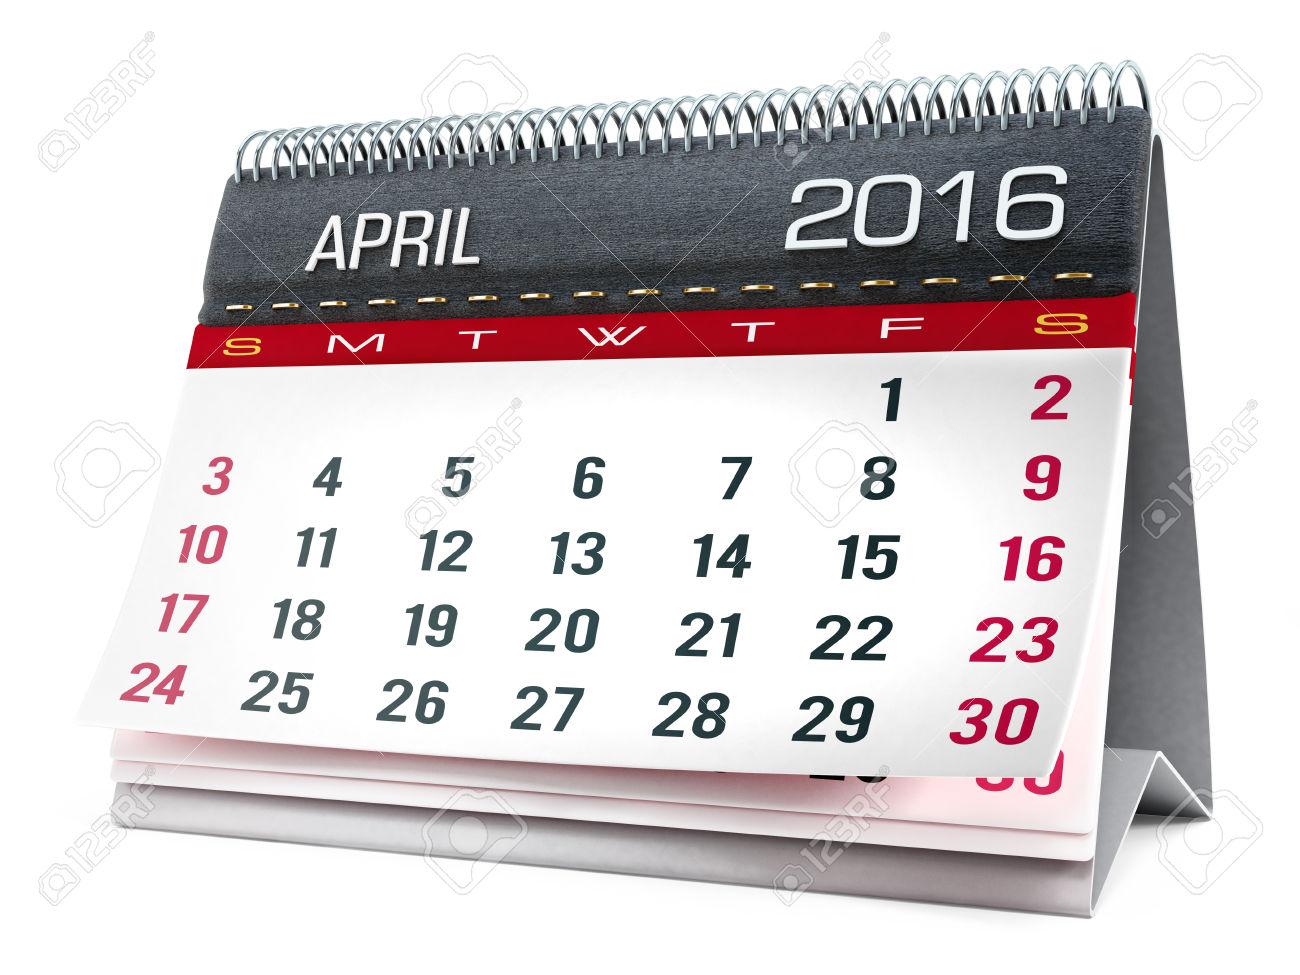 Desktop clipartfox . April 2016 calendar with clipart